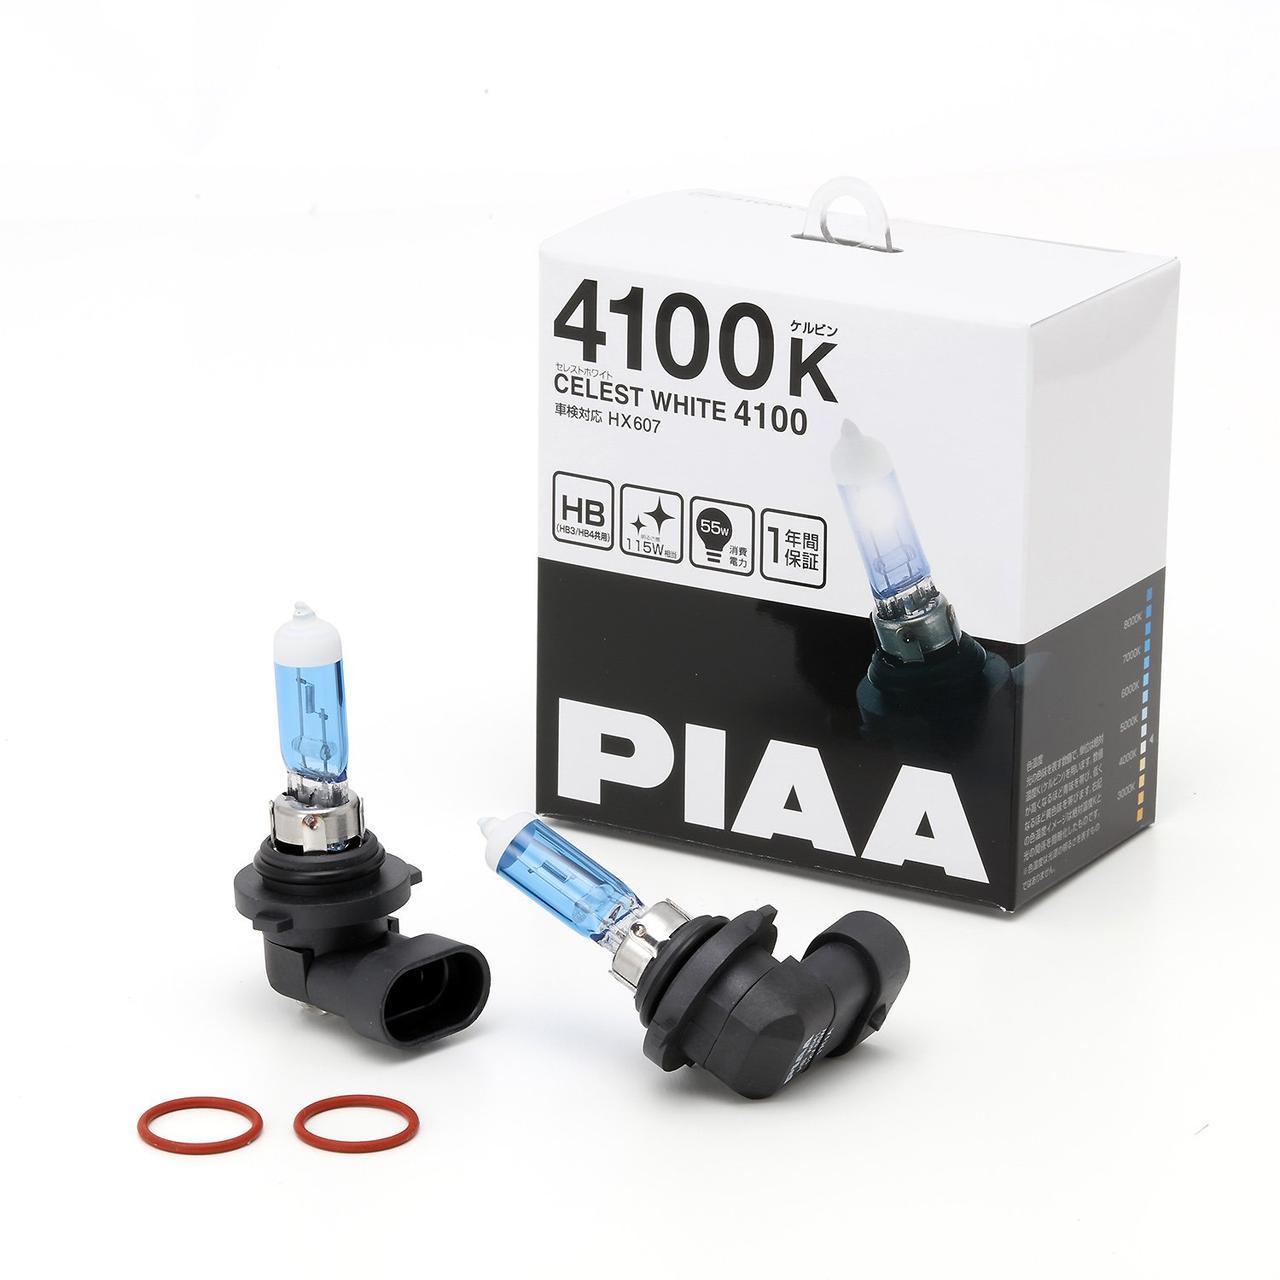 Автолампы PIAA Celest White HB4/HB3 4100K комплект 2шт. (HX-607)